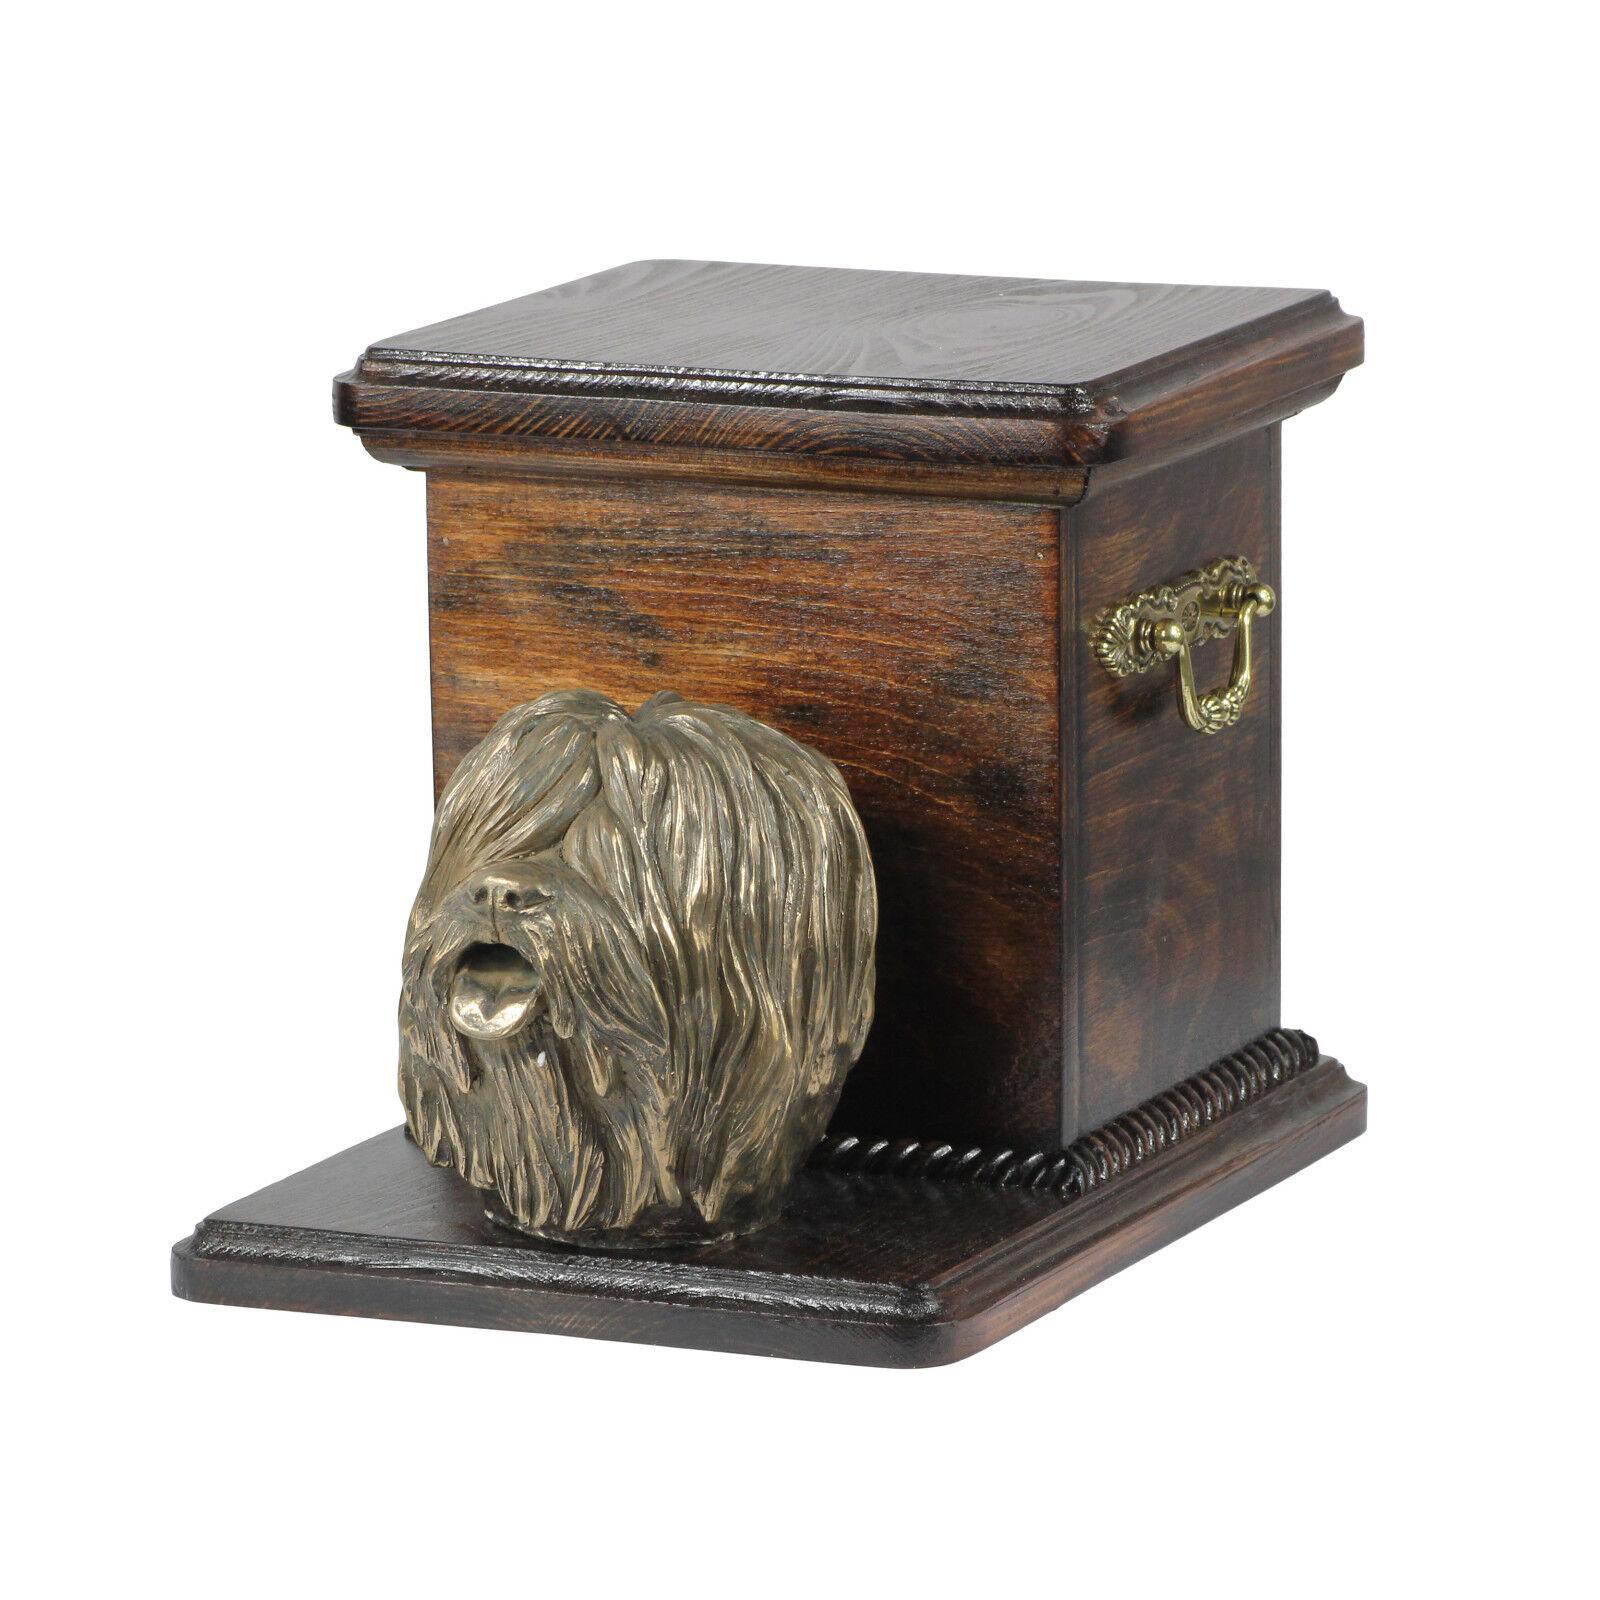 Polish Lowland Sheepdog Cremation Urn for Dog's ashes Dog statue Memorial Casket